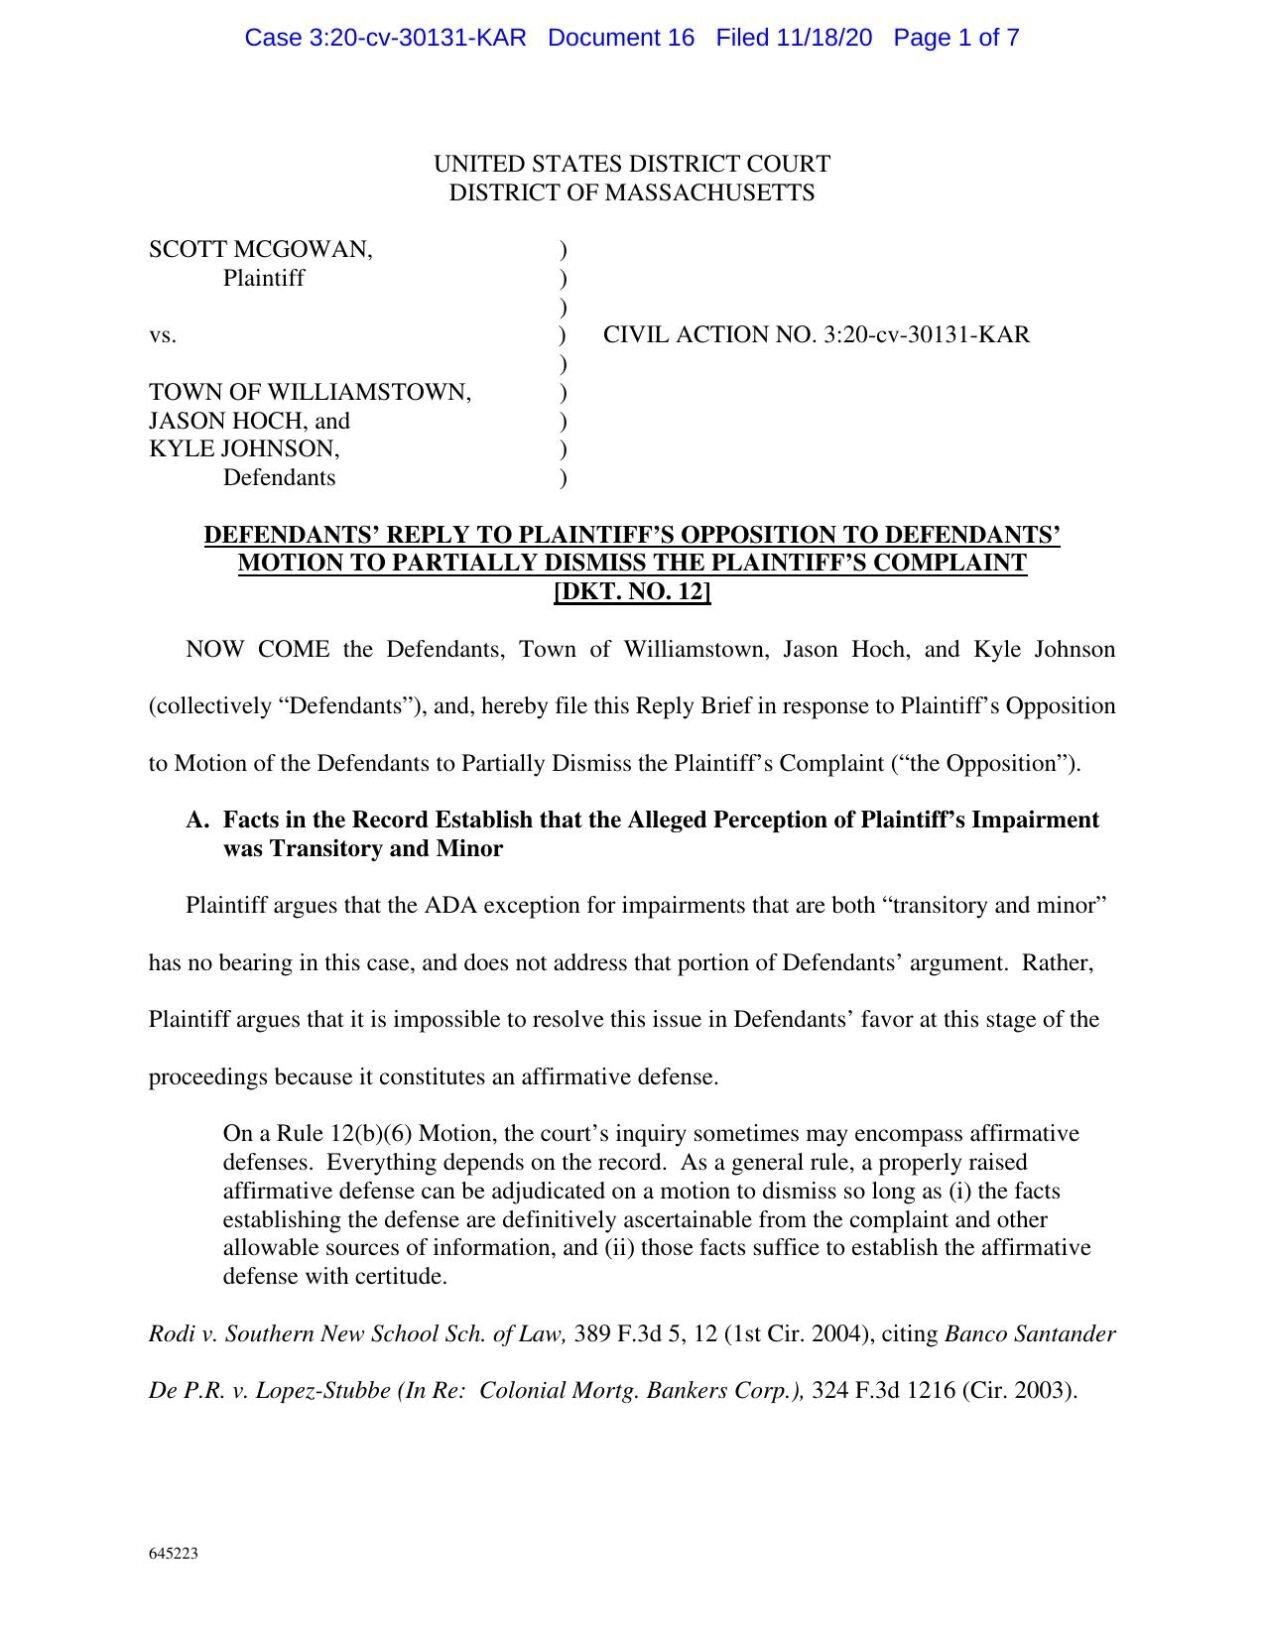 Williamstown brief in McGowan lawsuit Nov. 18, 2020